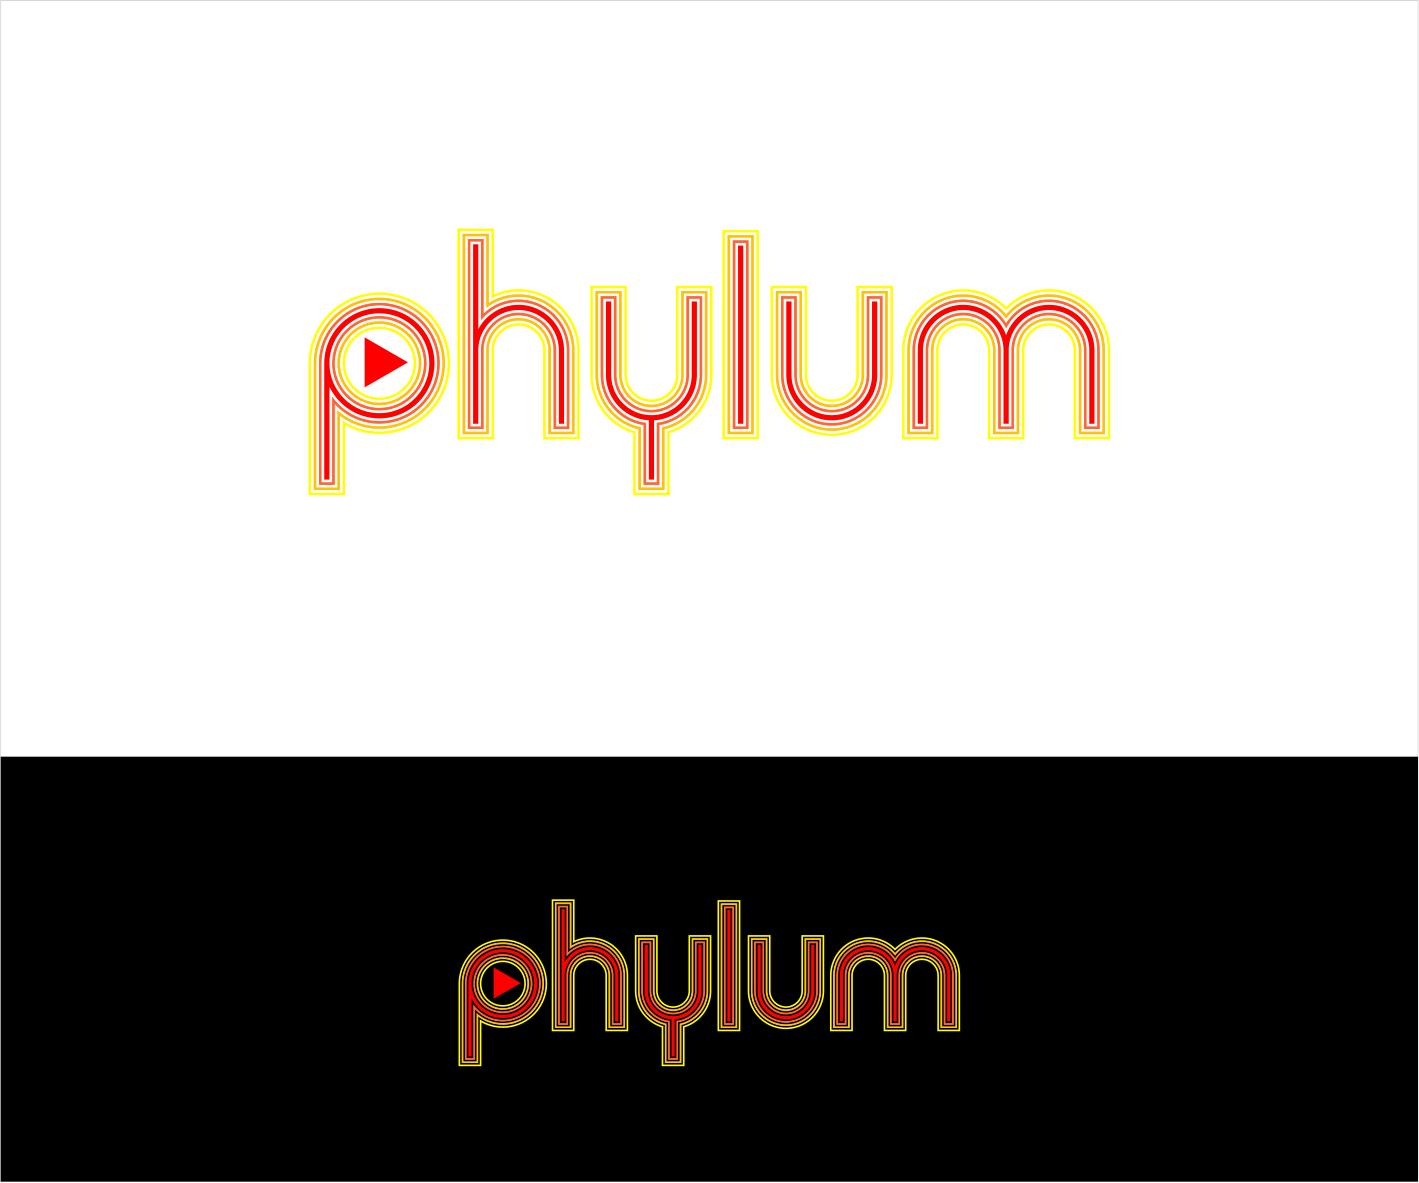 Modern Professional Logo Design For Phylum By Diana999 Design